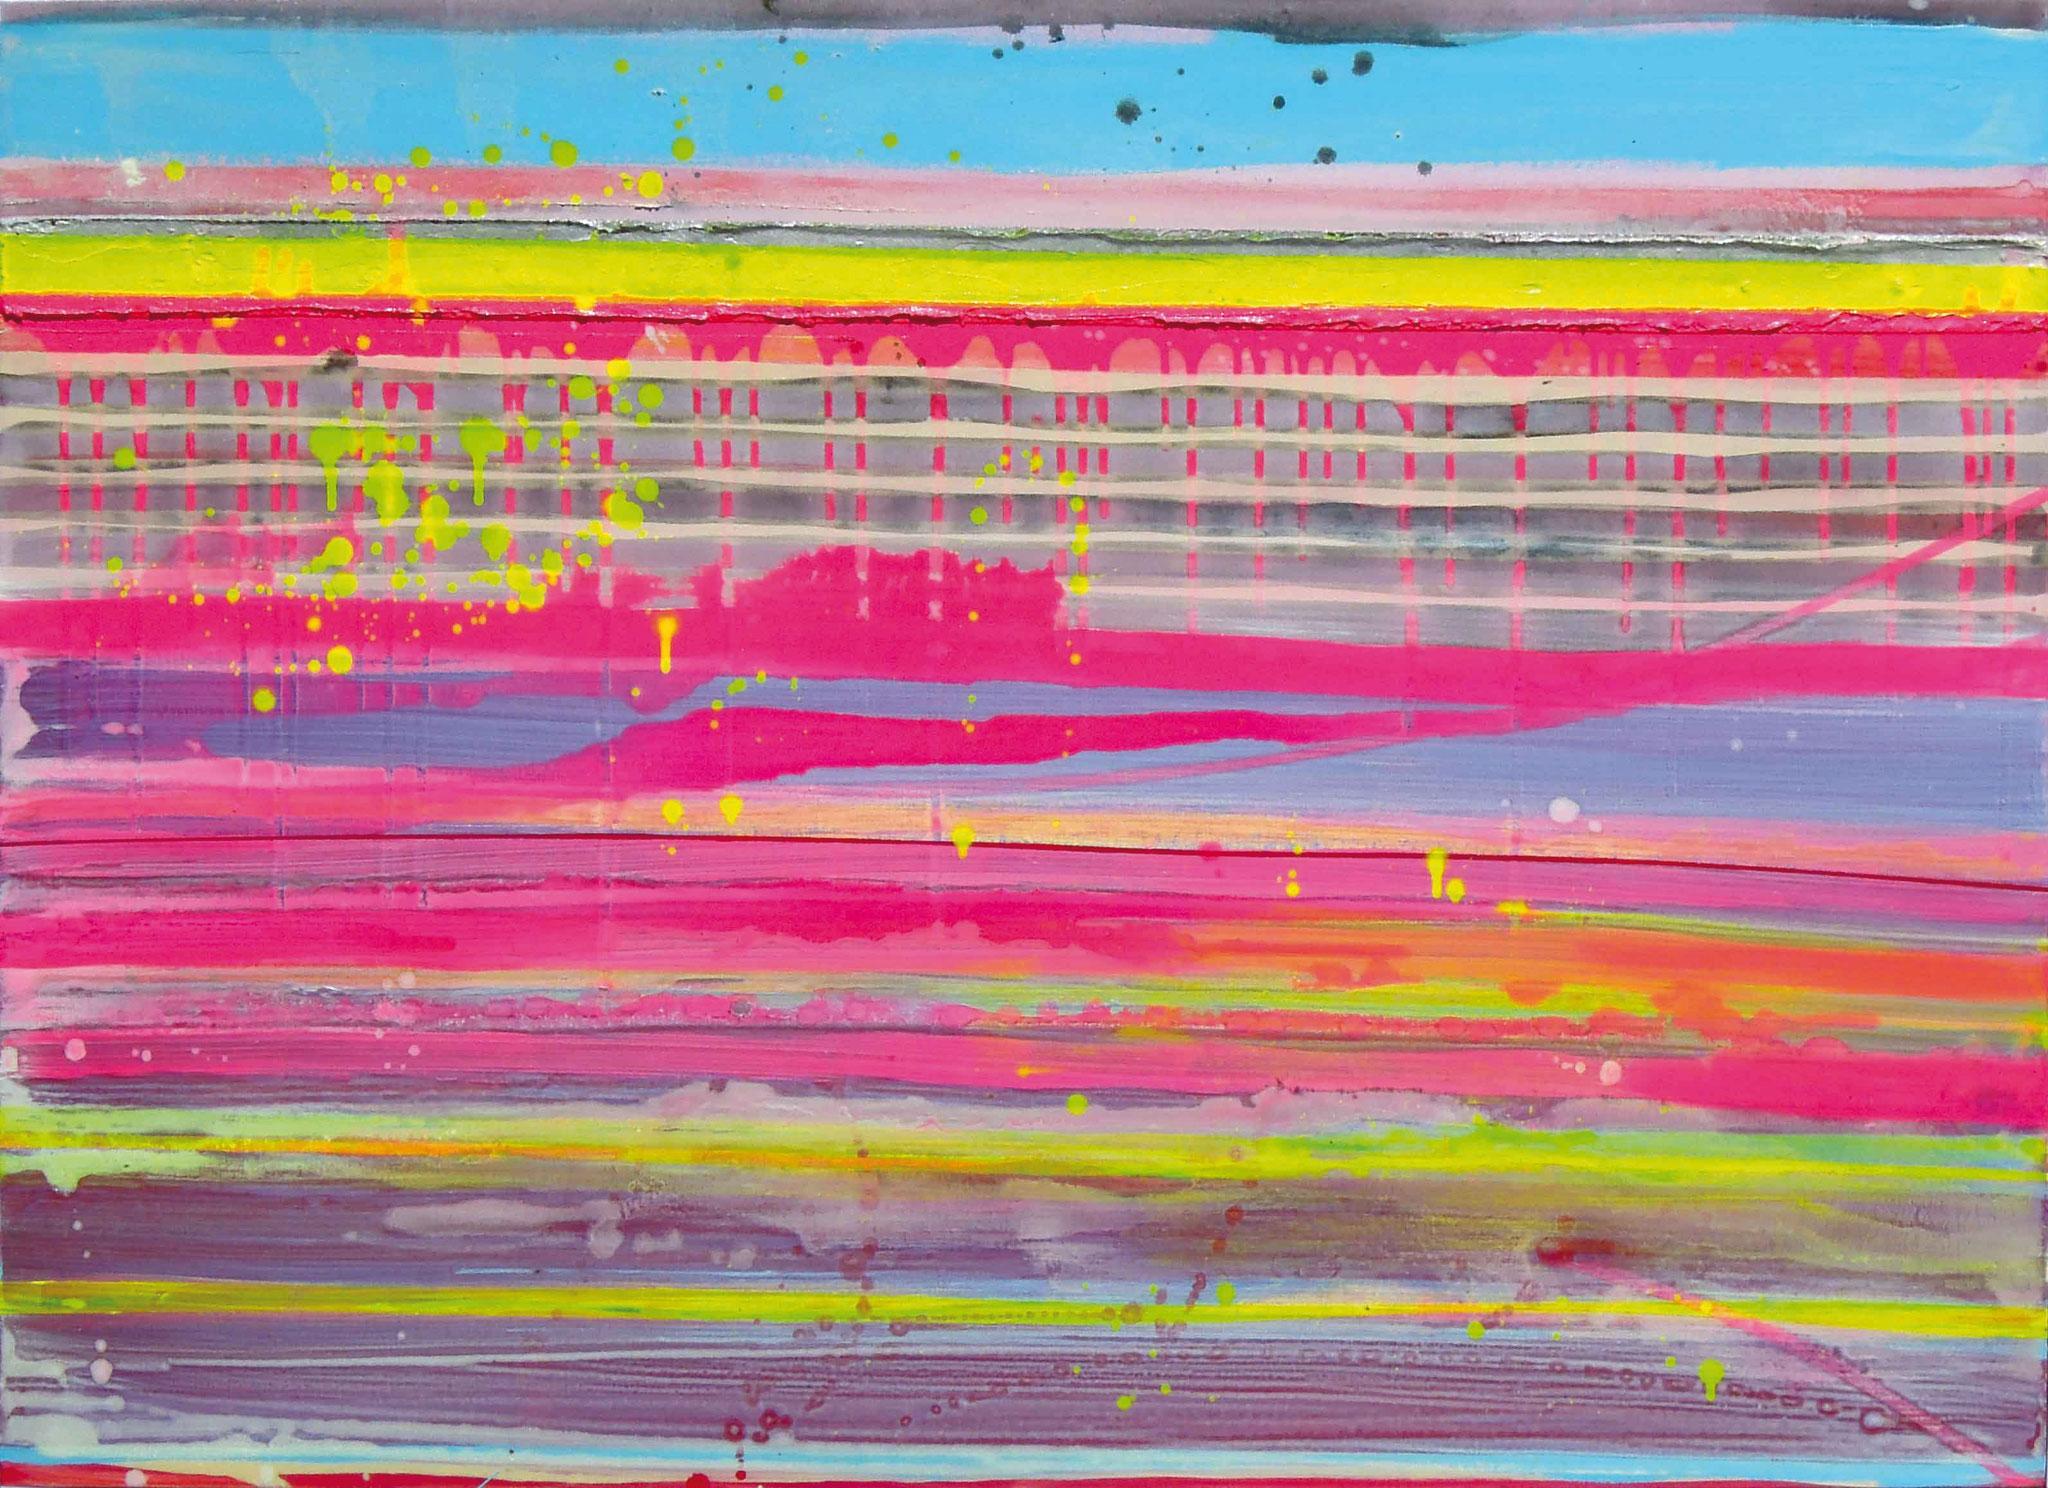 Stripes XVII   140x100cm 2014 Pigmente / Binder auf Leinwand